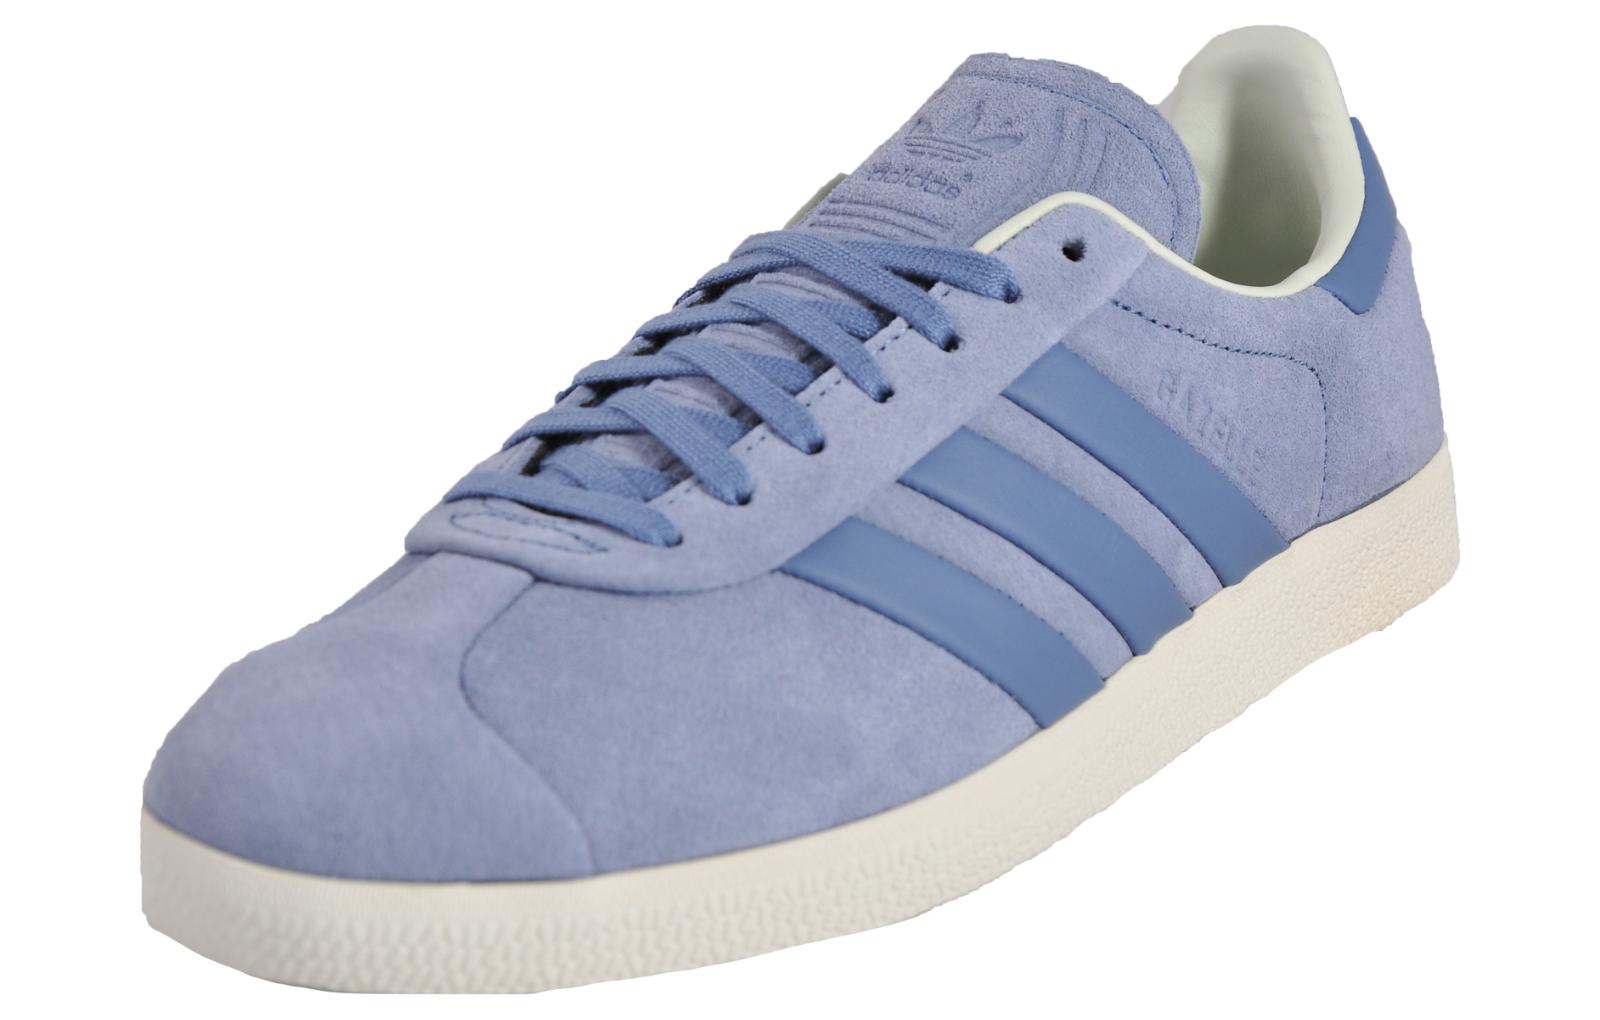 4d75969024d4e Adidas Originals Gazelle Stitch & Turn Mens -